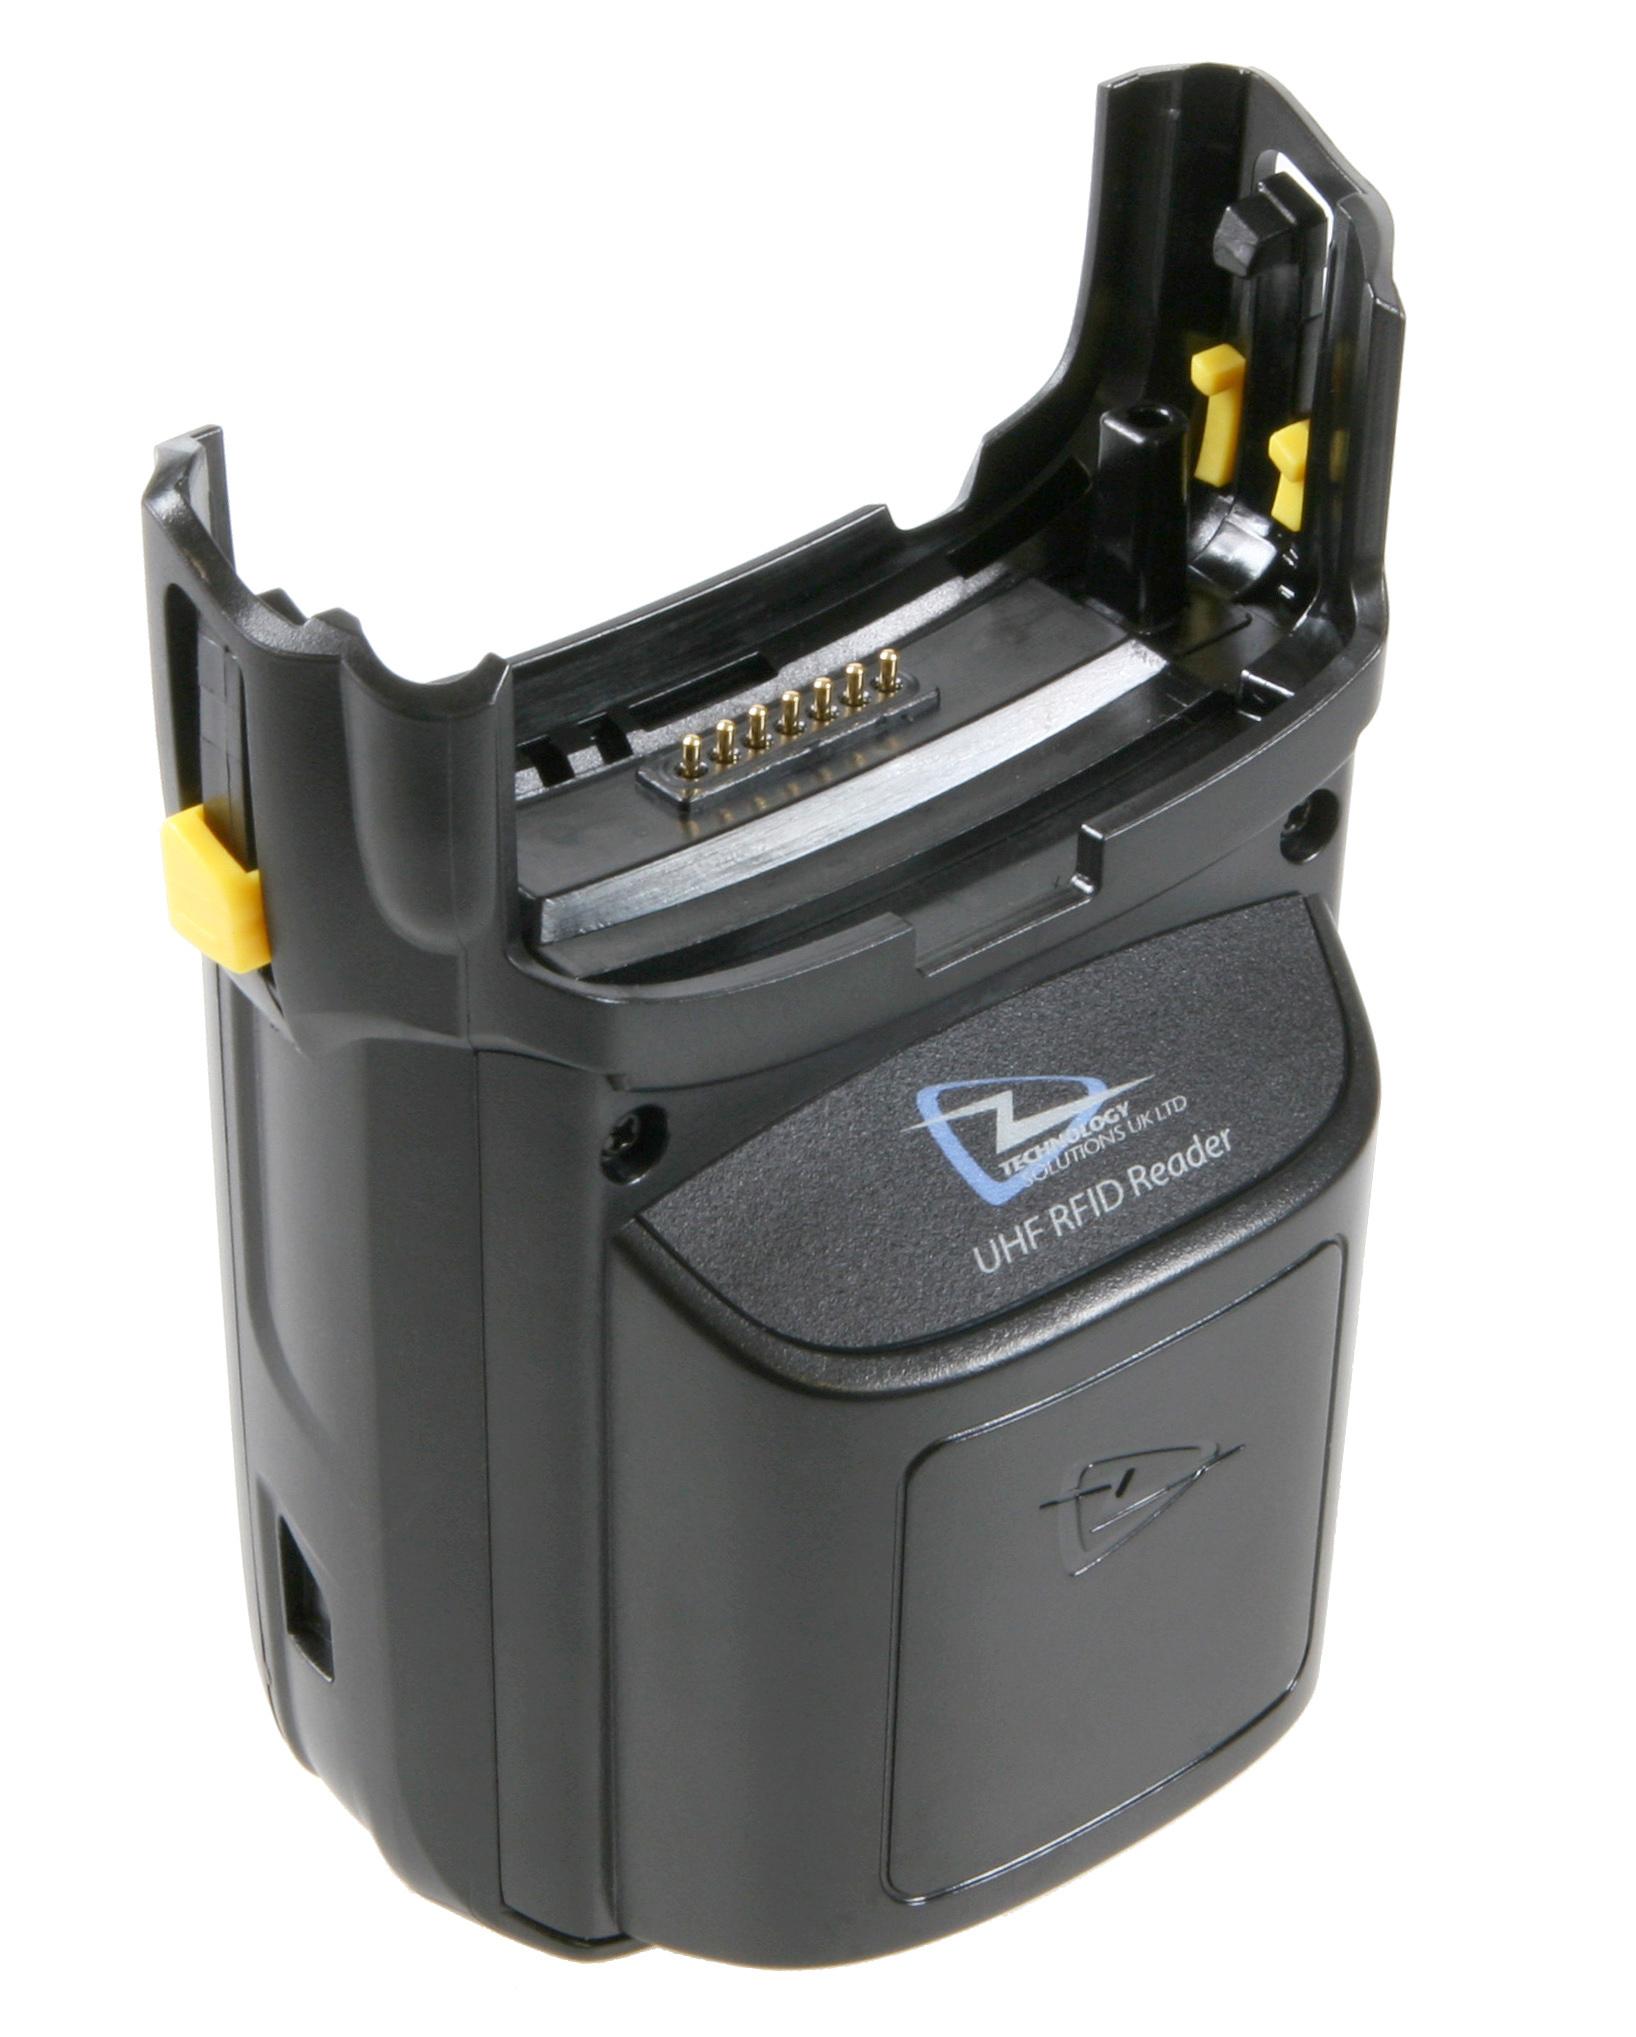 1119 UHF RFID Reader for the Motorola MC55/65/67